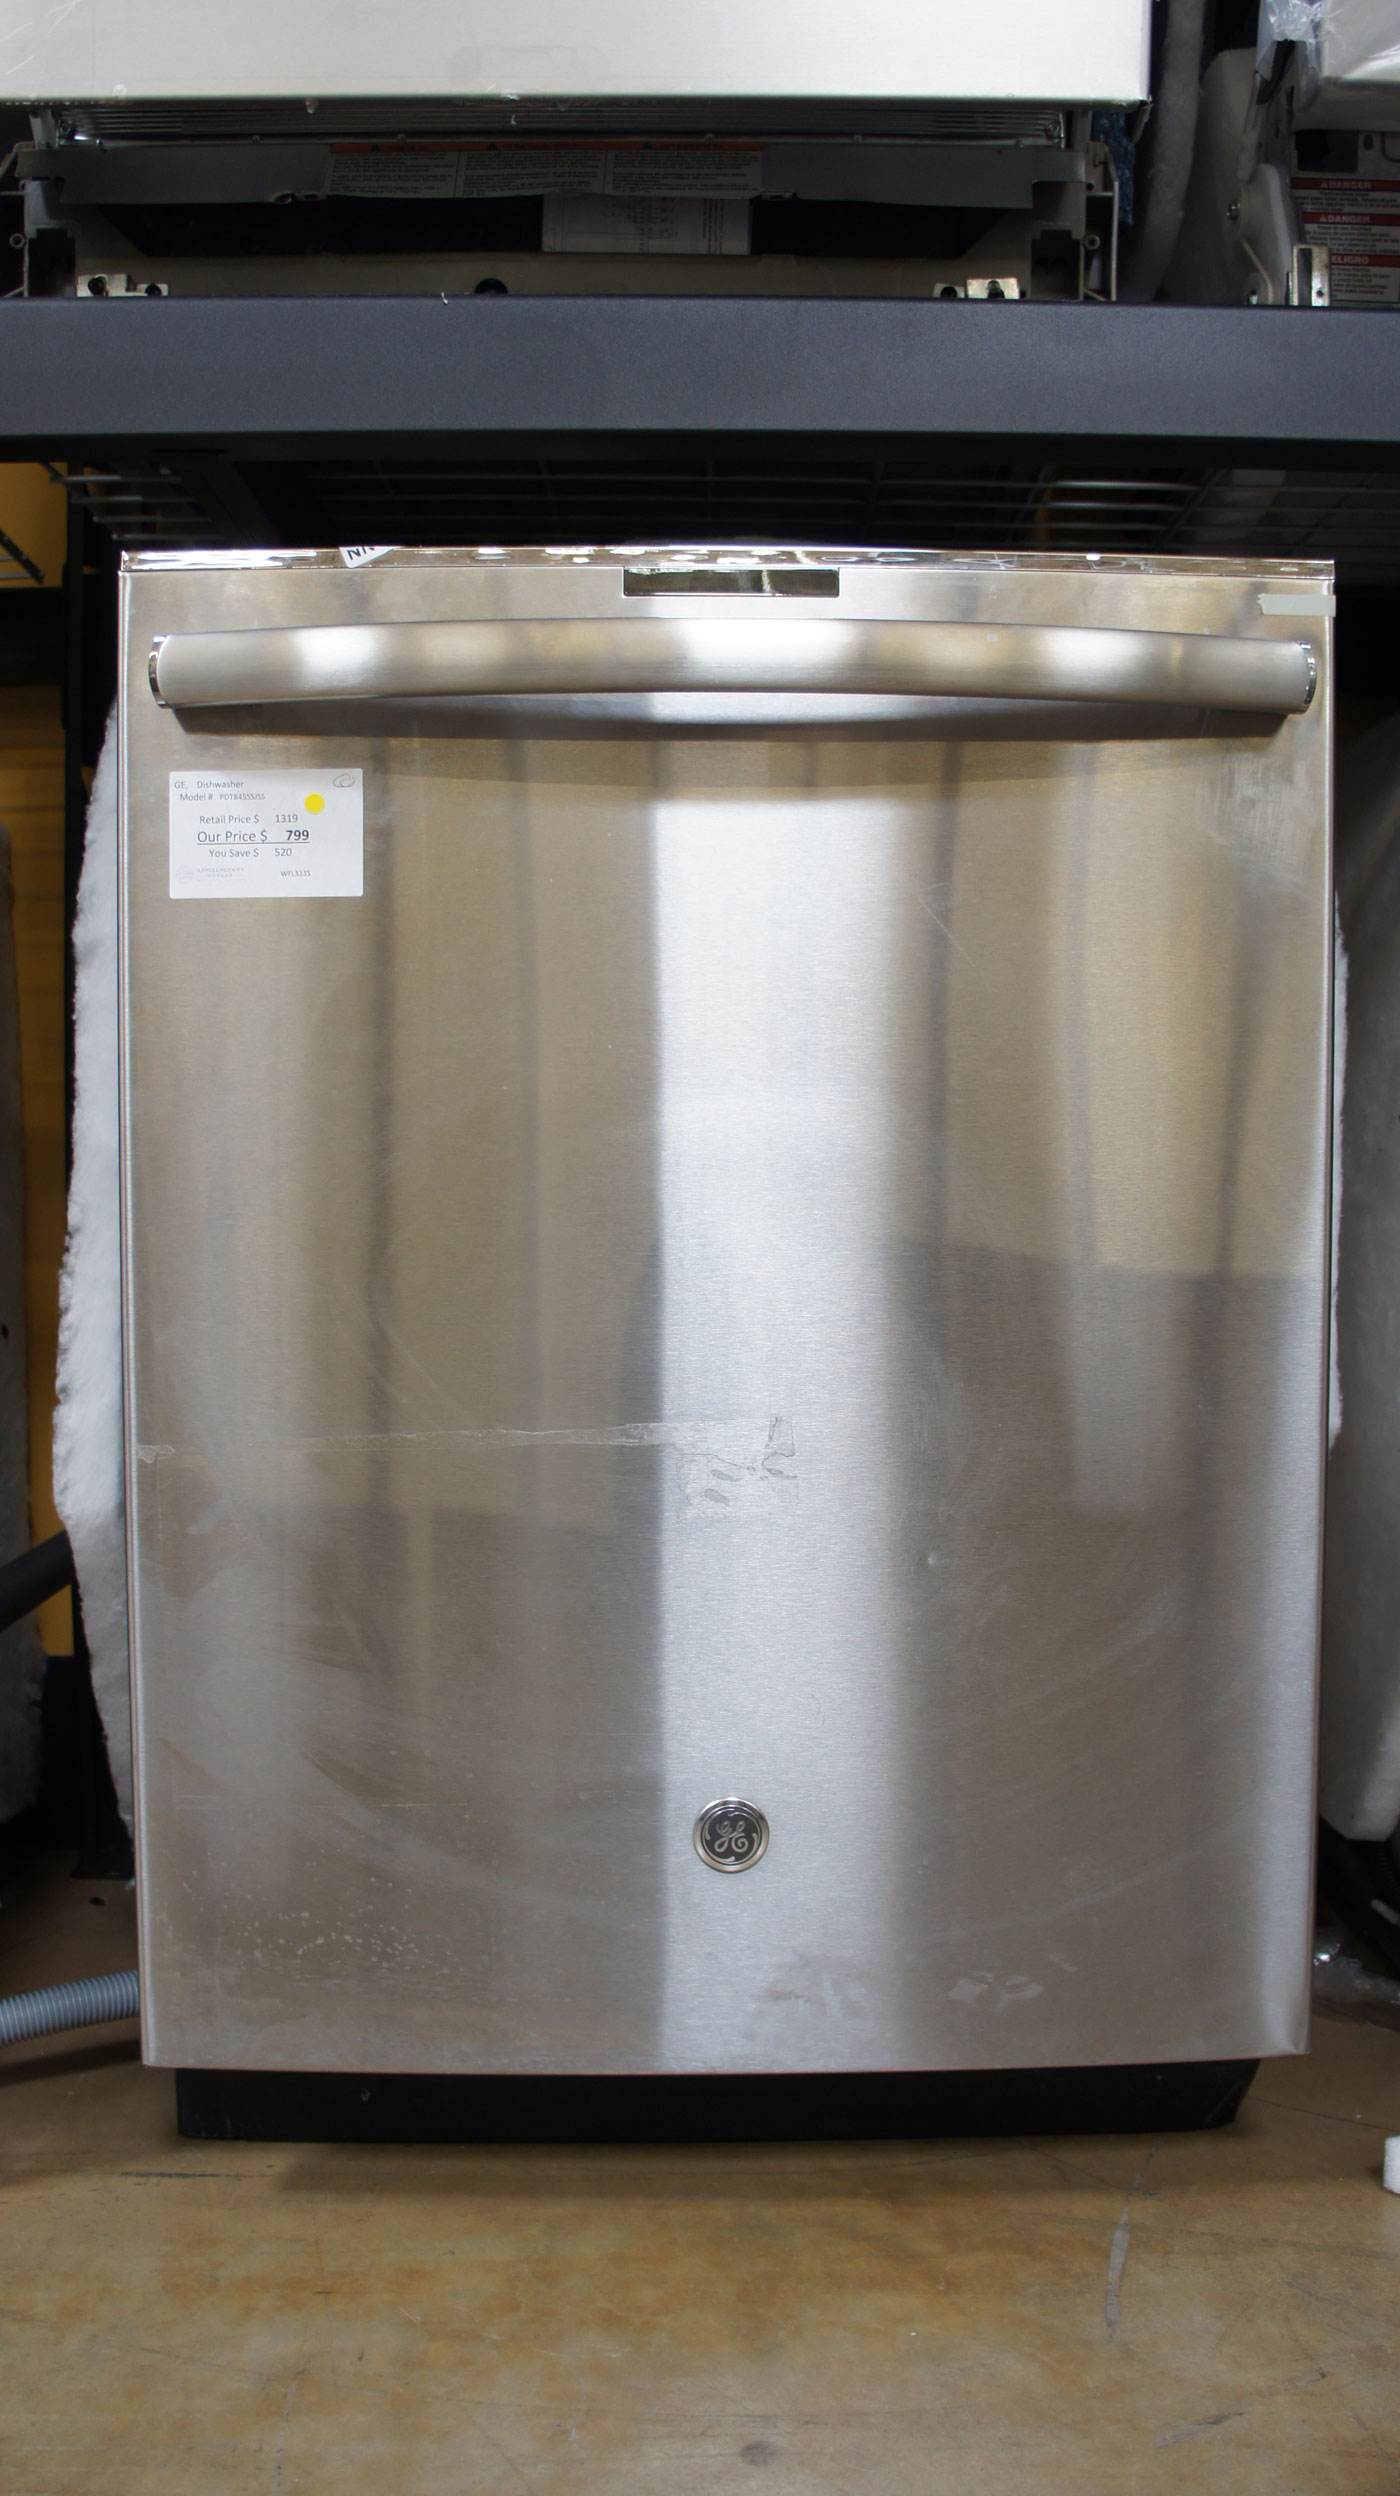 "24"" GE PDT845SSJSS Dishwasher"